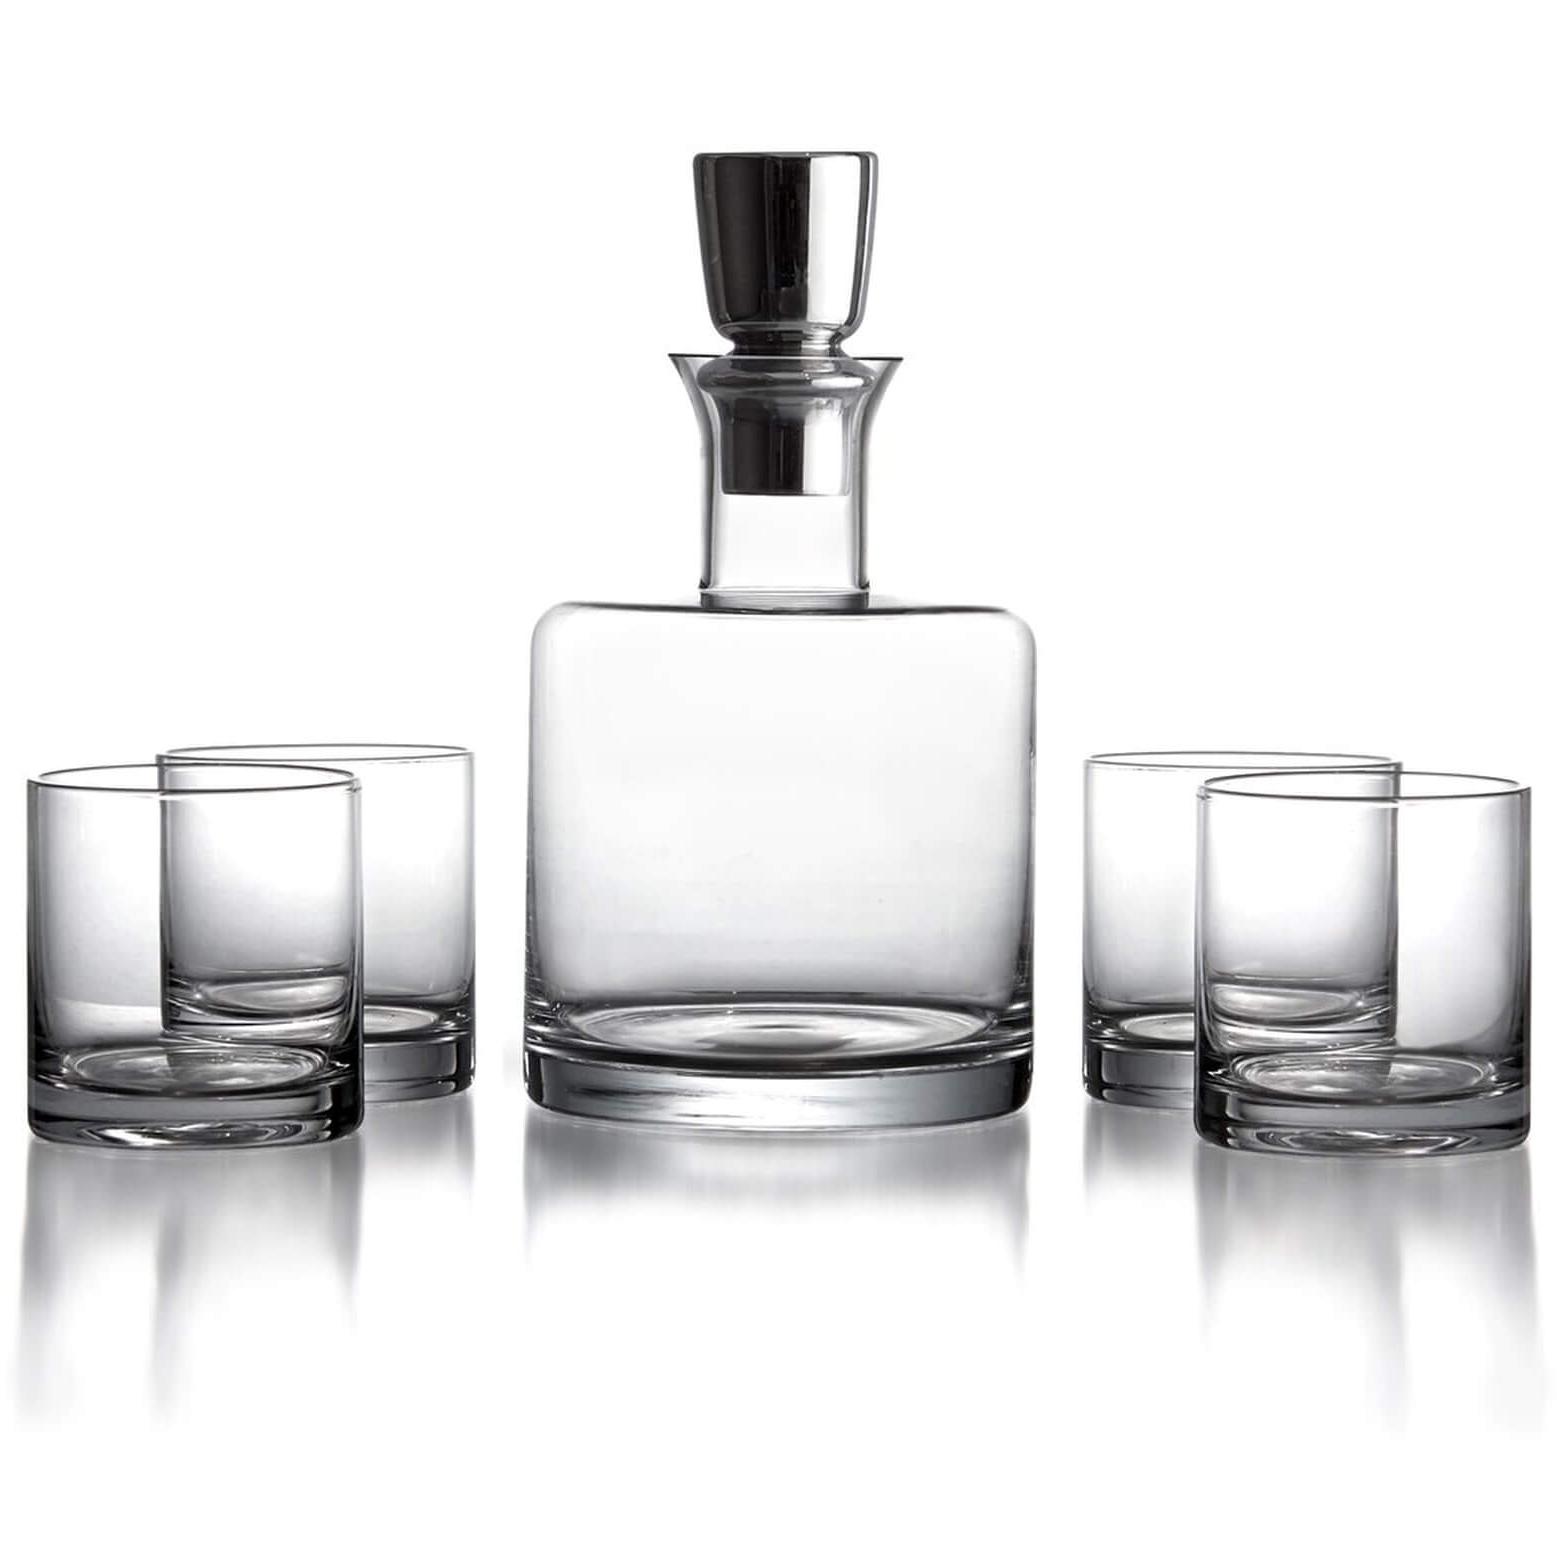 American Atelier Linus Decanter & Whiskey Glasses Nordstrom Anniversary Sale.jpg